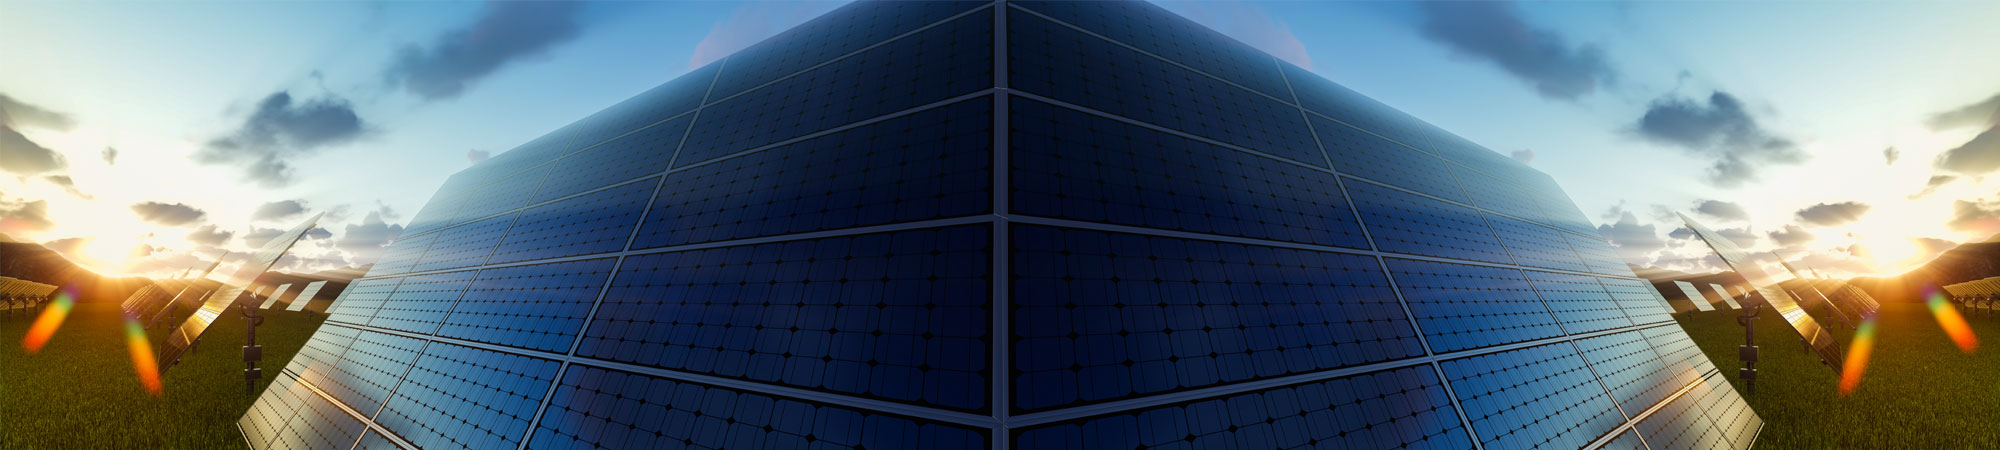 Photo of Solar Panel Farm